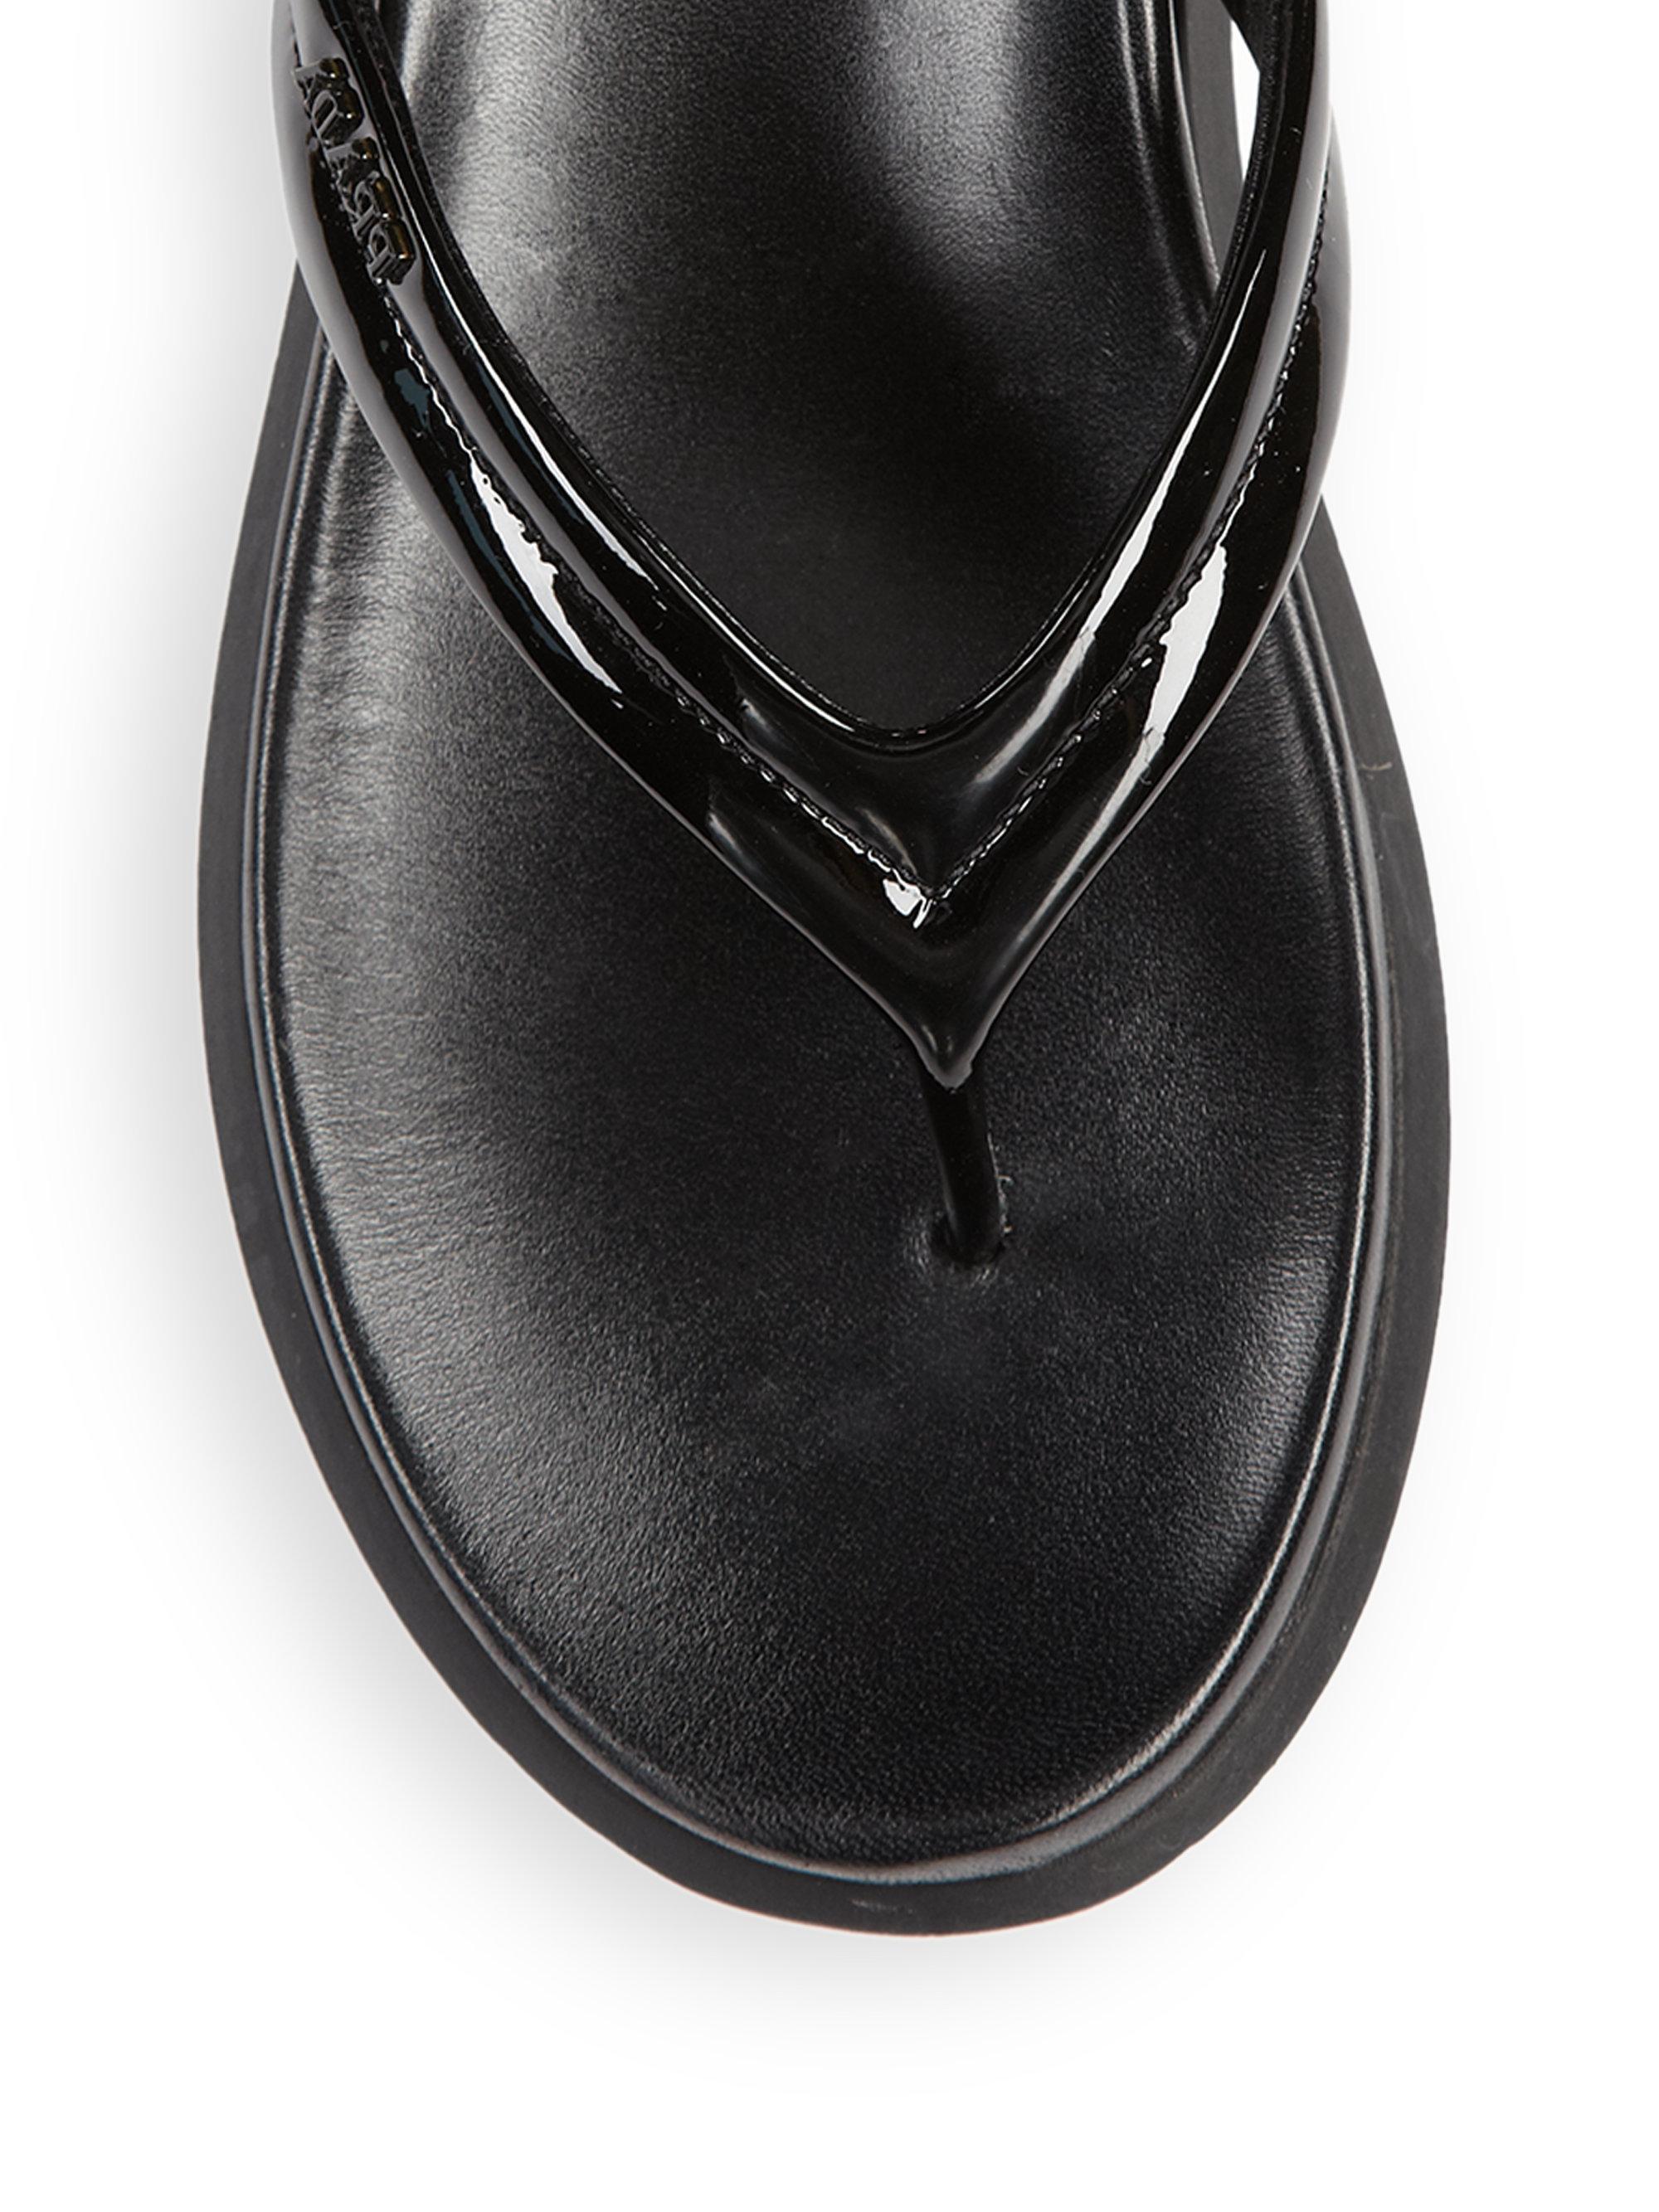 ecbe80d89 prada leather flip flops prada designer bags - Prada Patent Leather Flip  Flops in Black